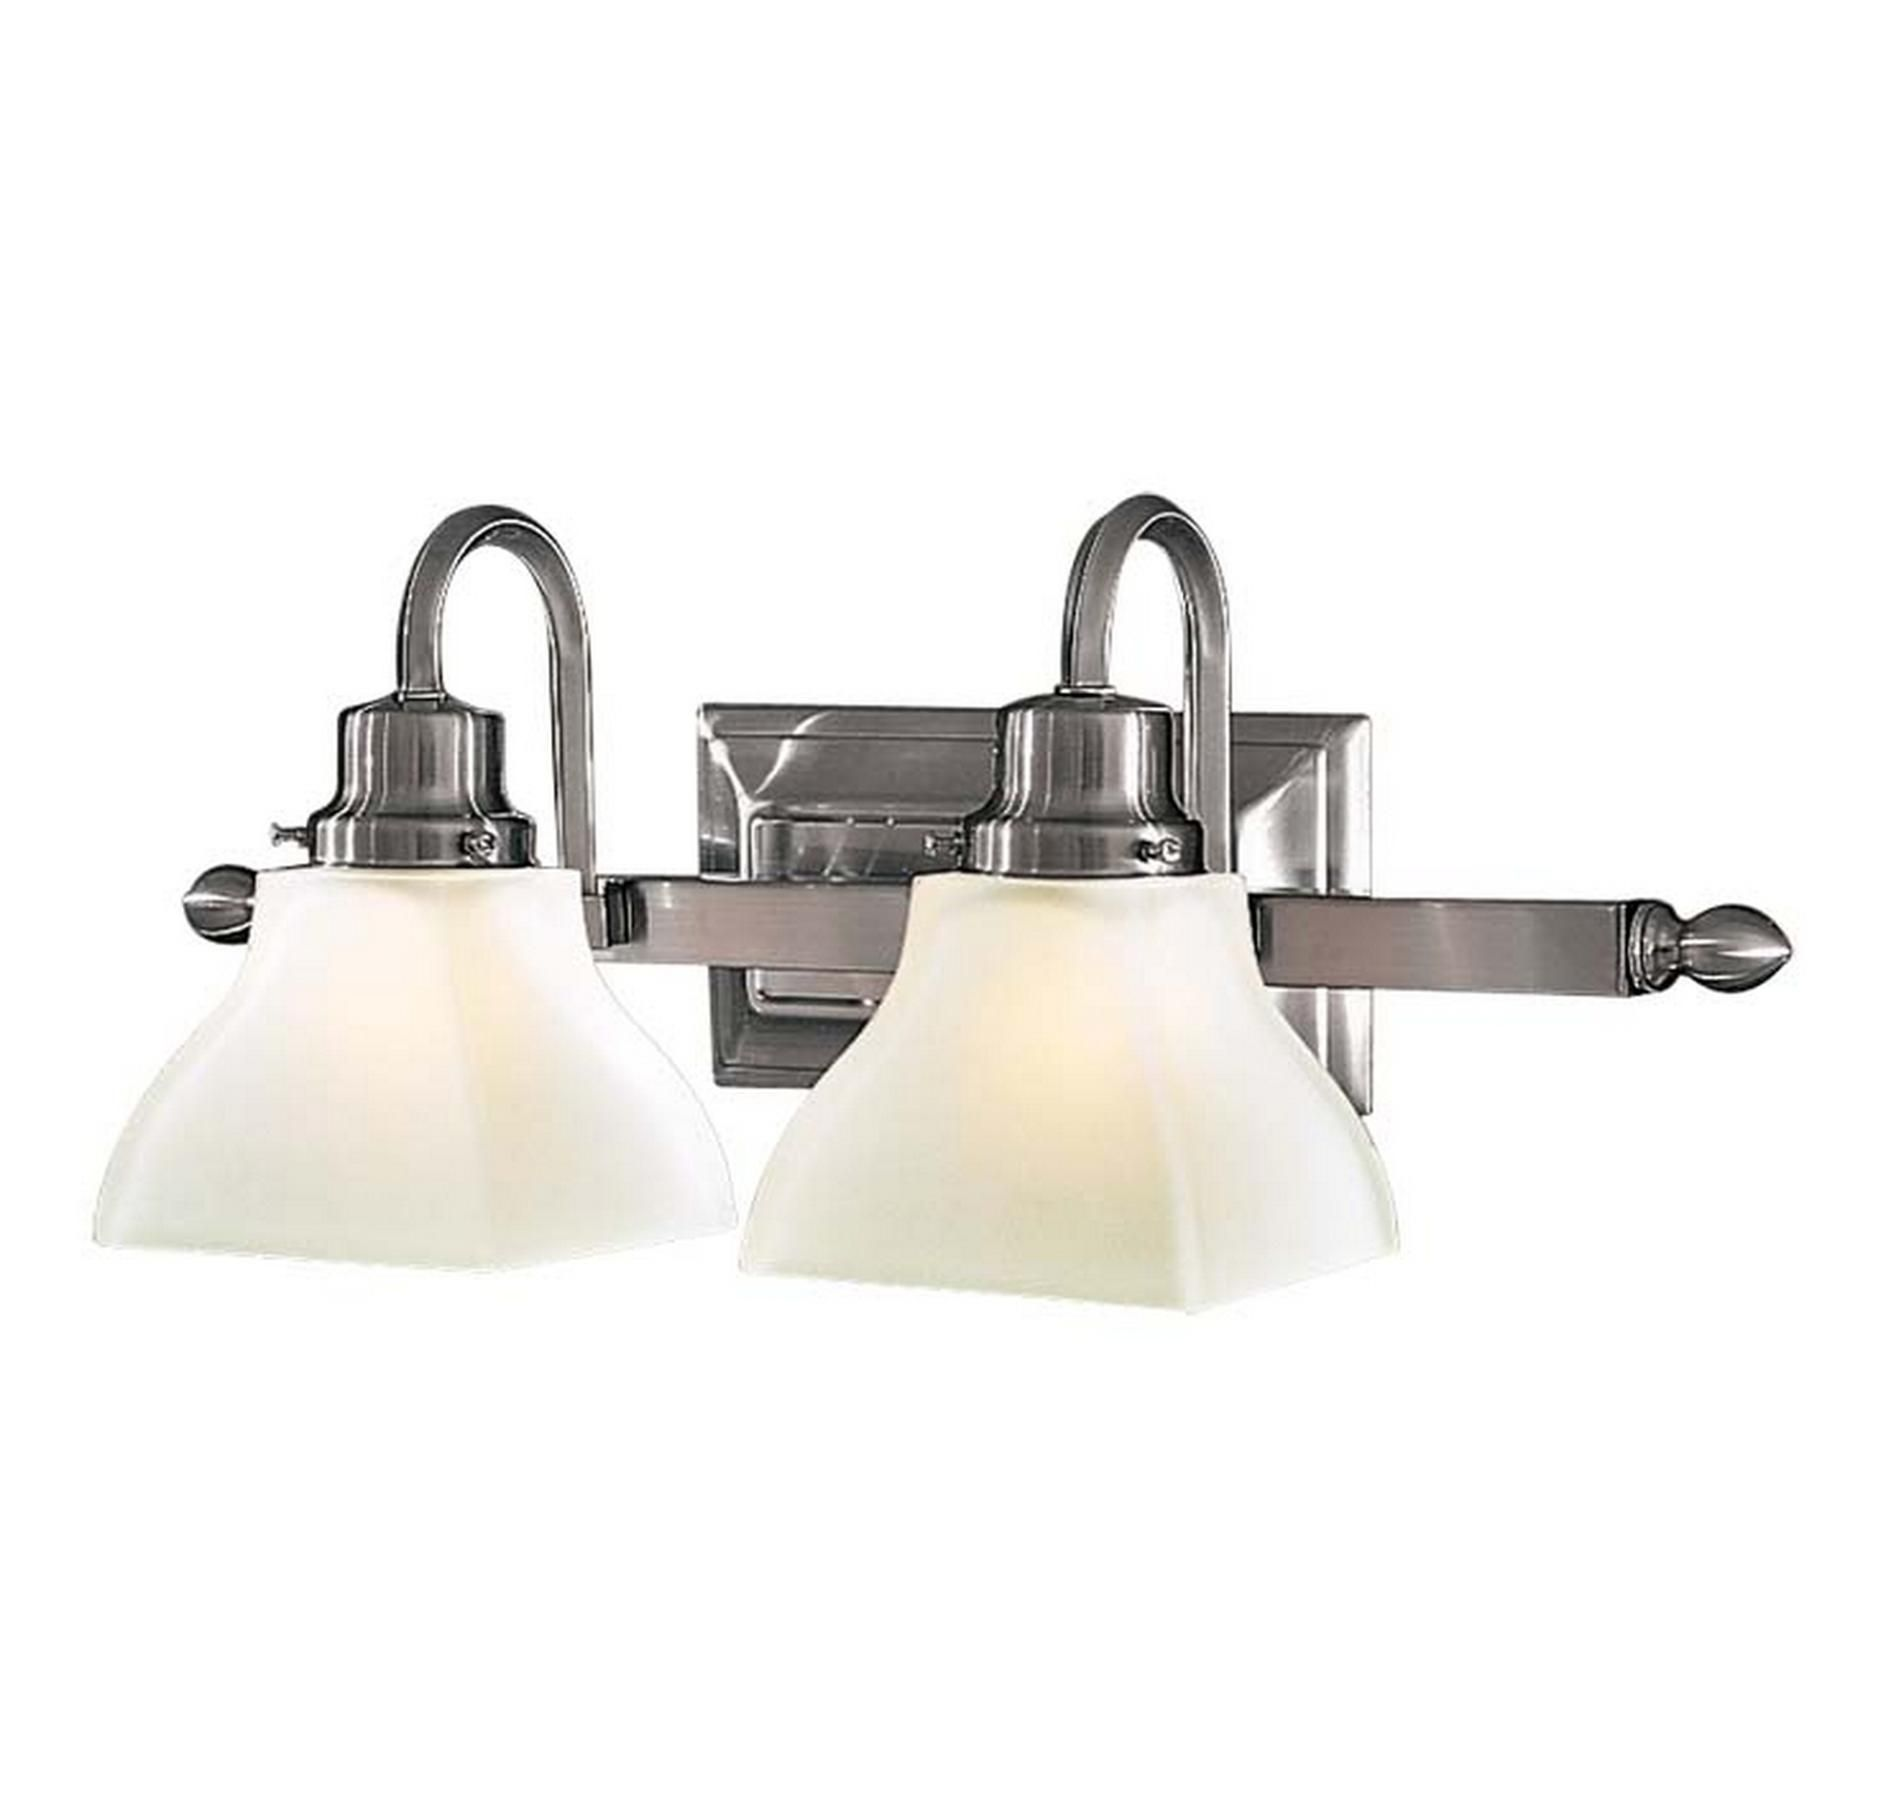 Minka Lavery 558284 2 Light Bath In Wall Lights Bath Lights Prepossessing Minka Lavery Bathroom Lighting Review